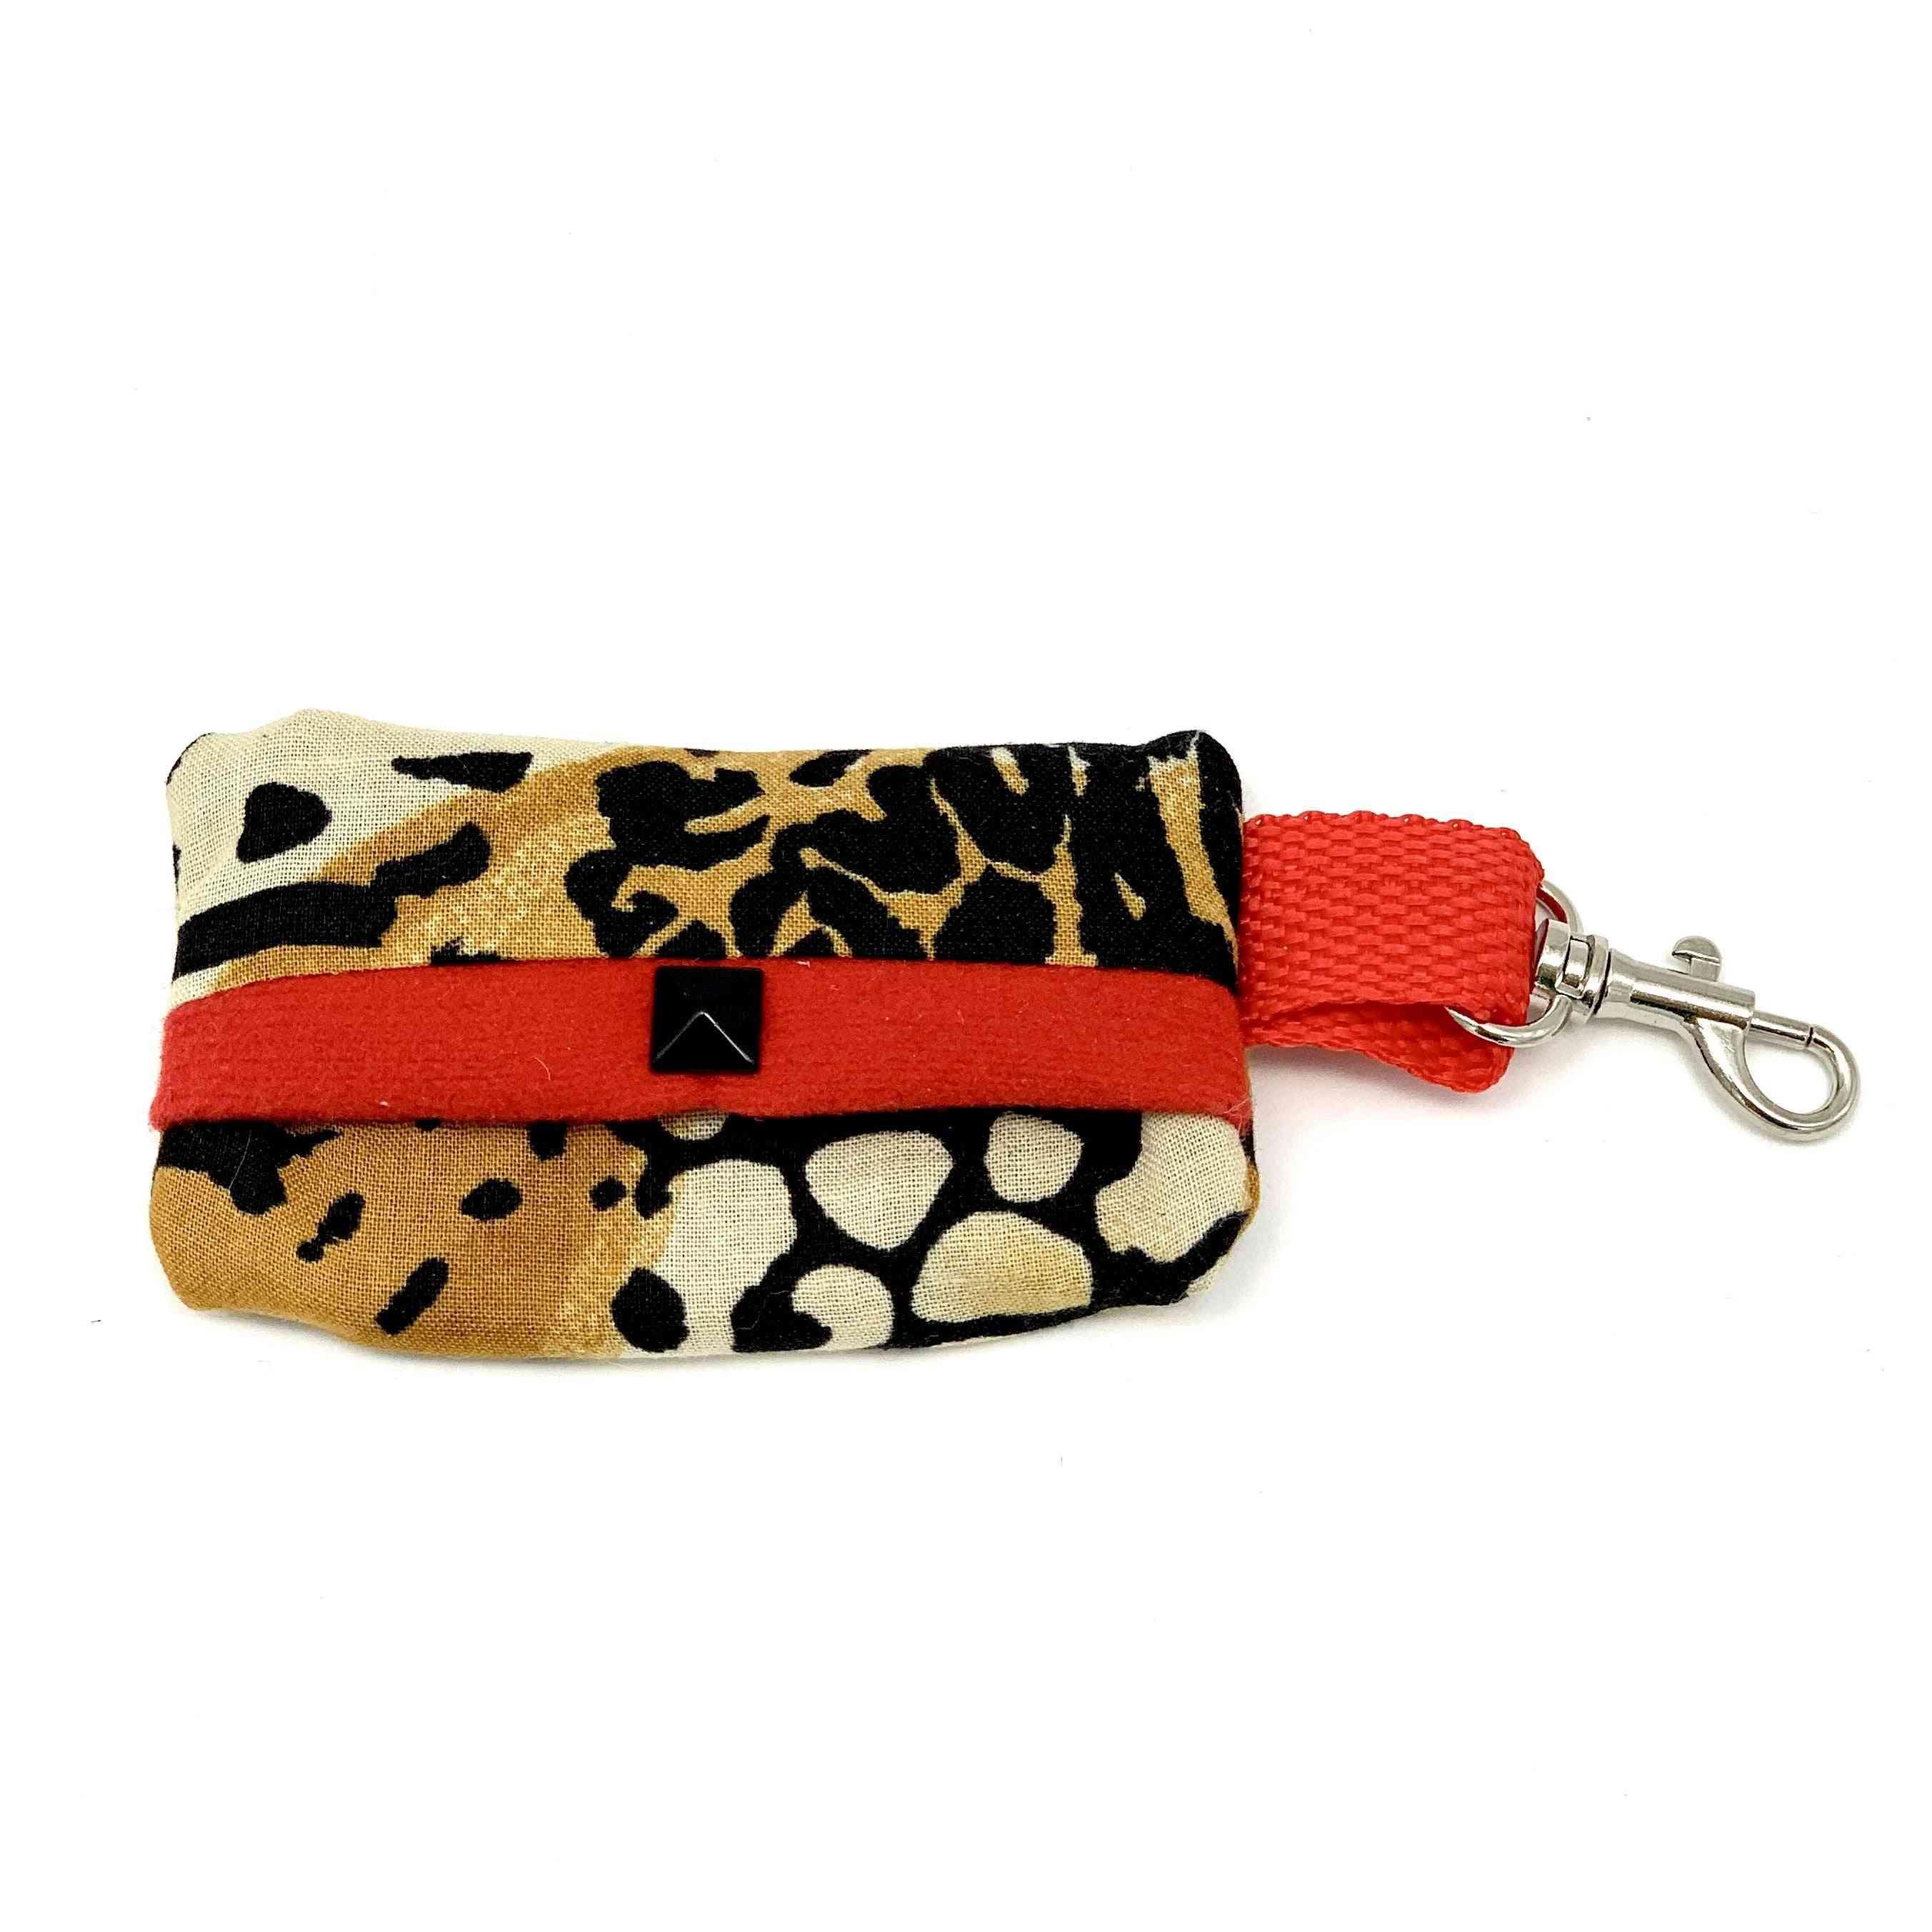 Leopard Dog Waste Bag Holder With Red Suede Lining